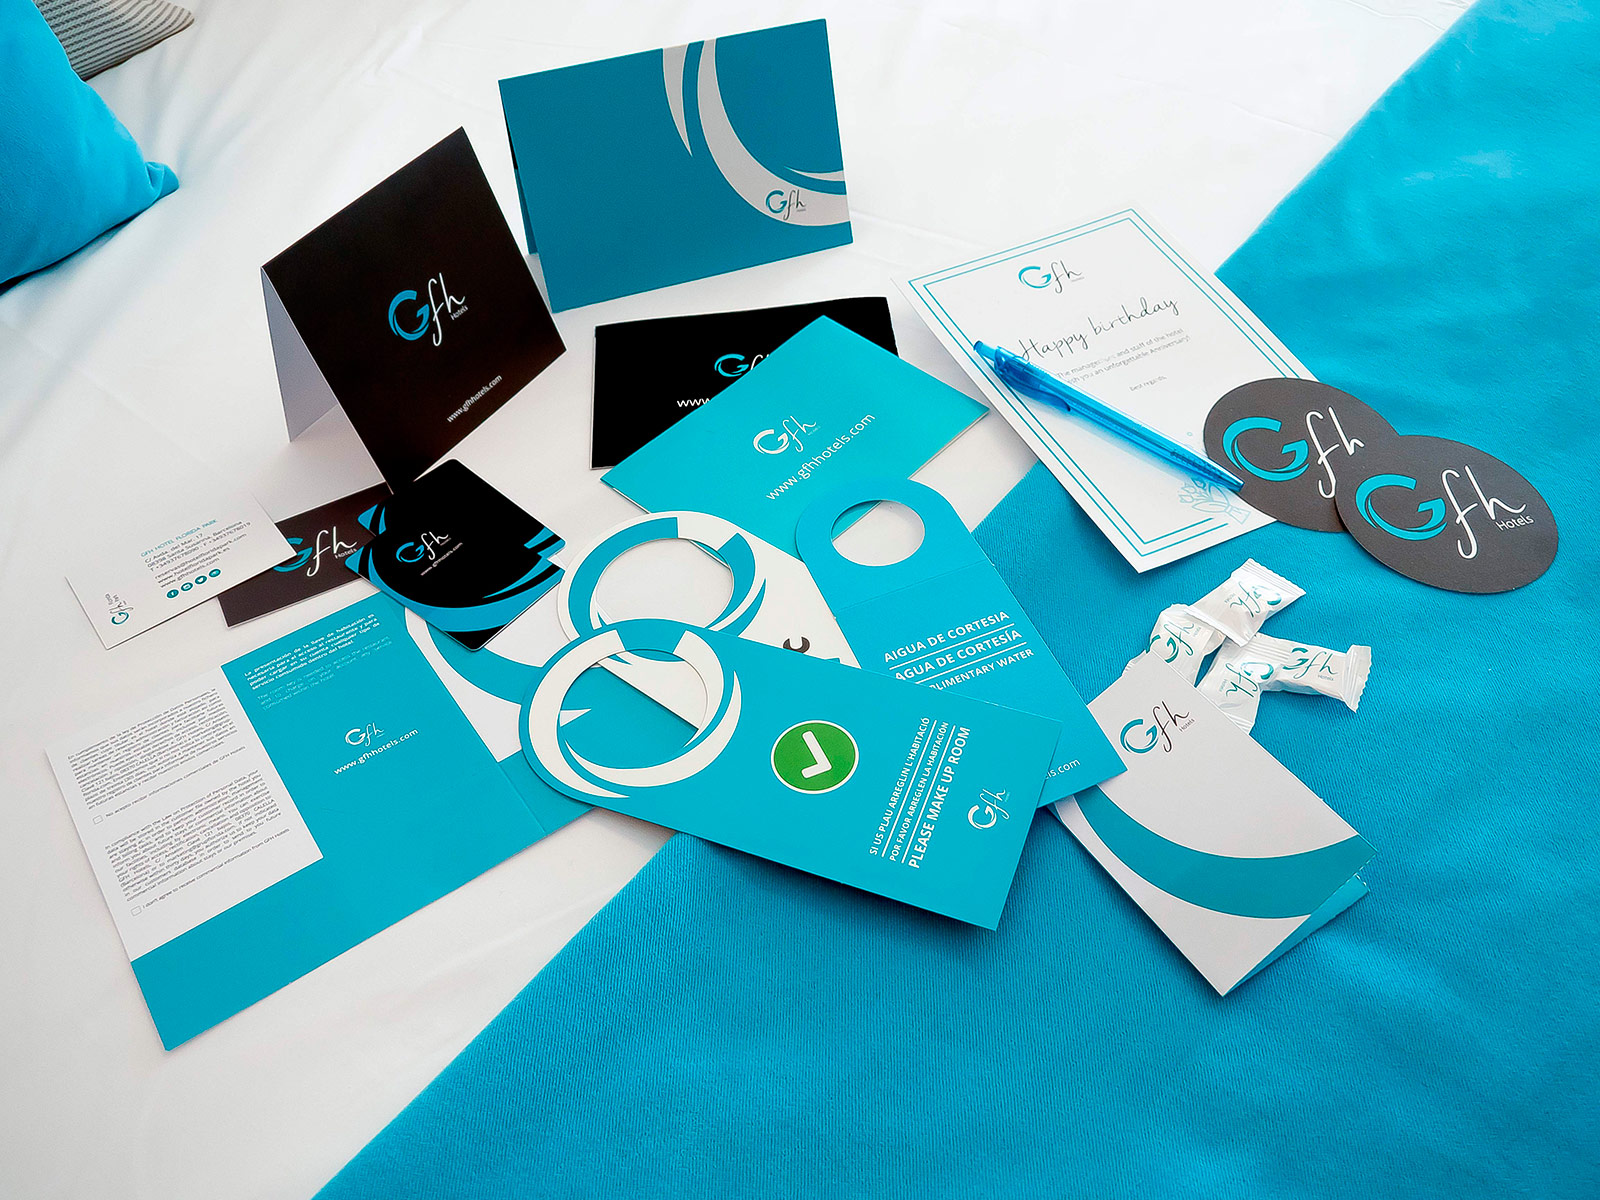 diseño grafico  Identidad corporativa     14